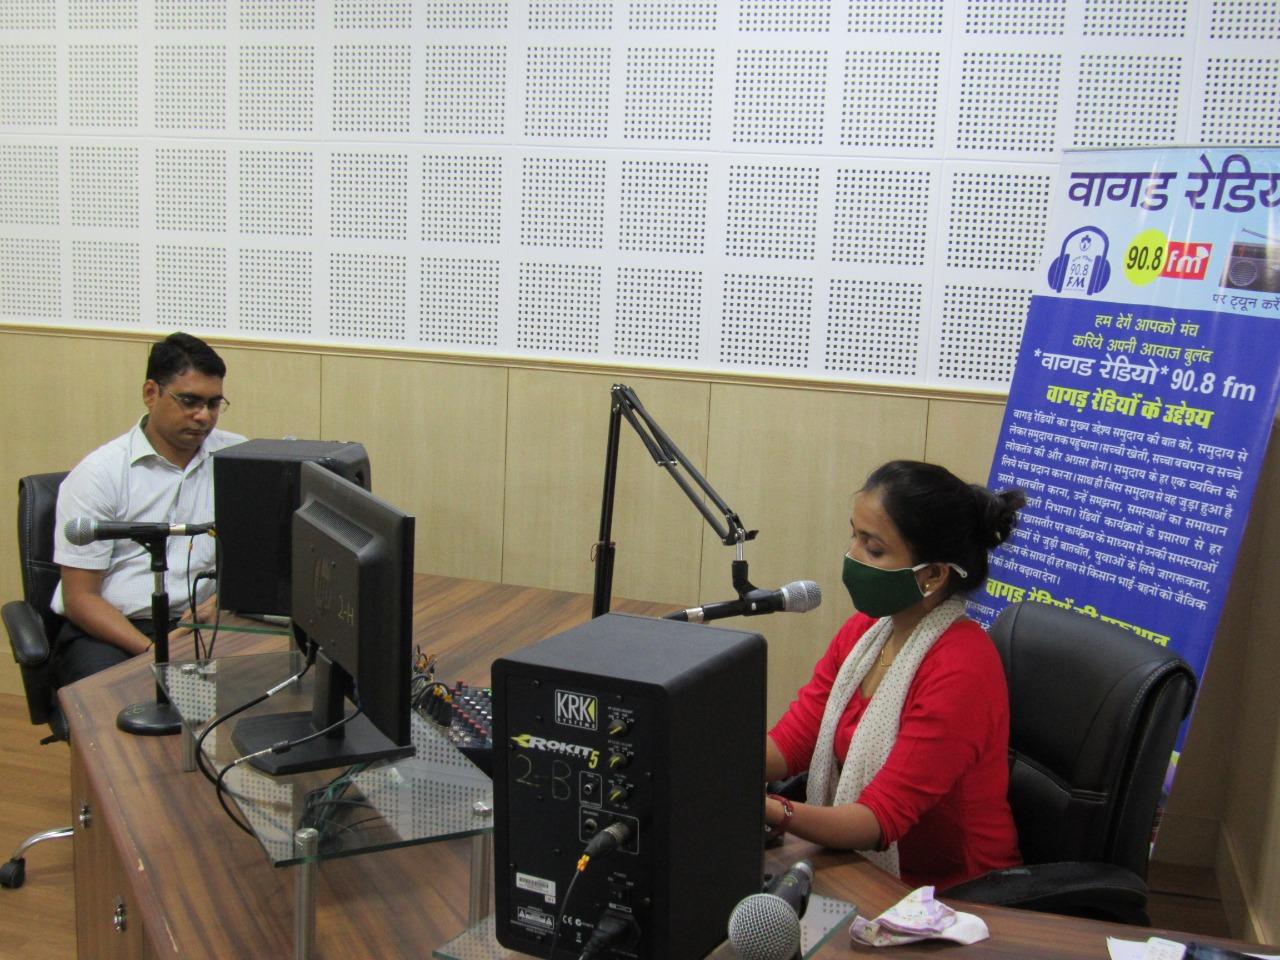 vaagdhara-donated-oxygen-concentrator-collector-banswara-3